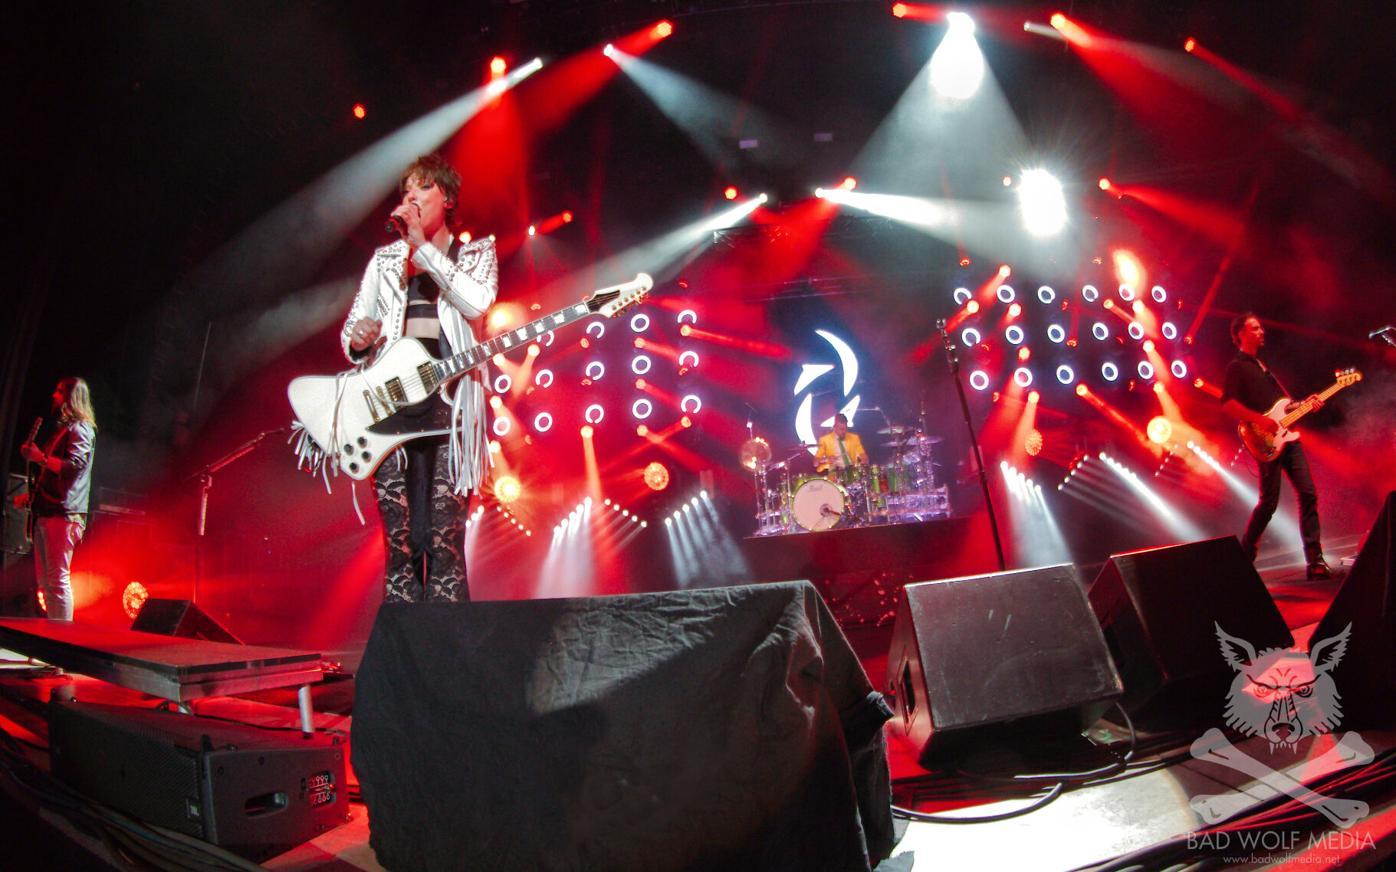 Halestorm rocks the stage